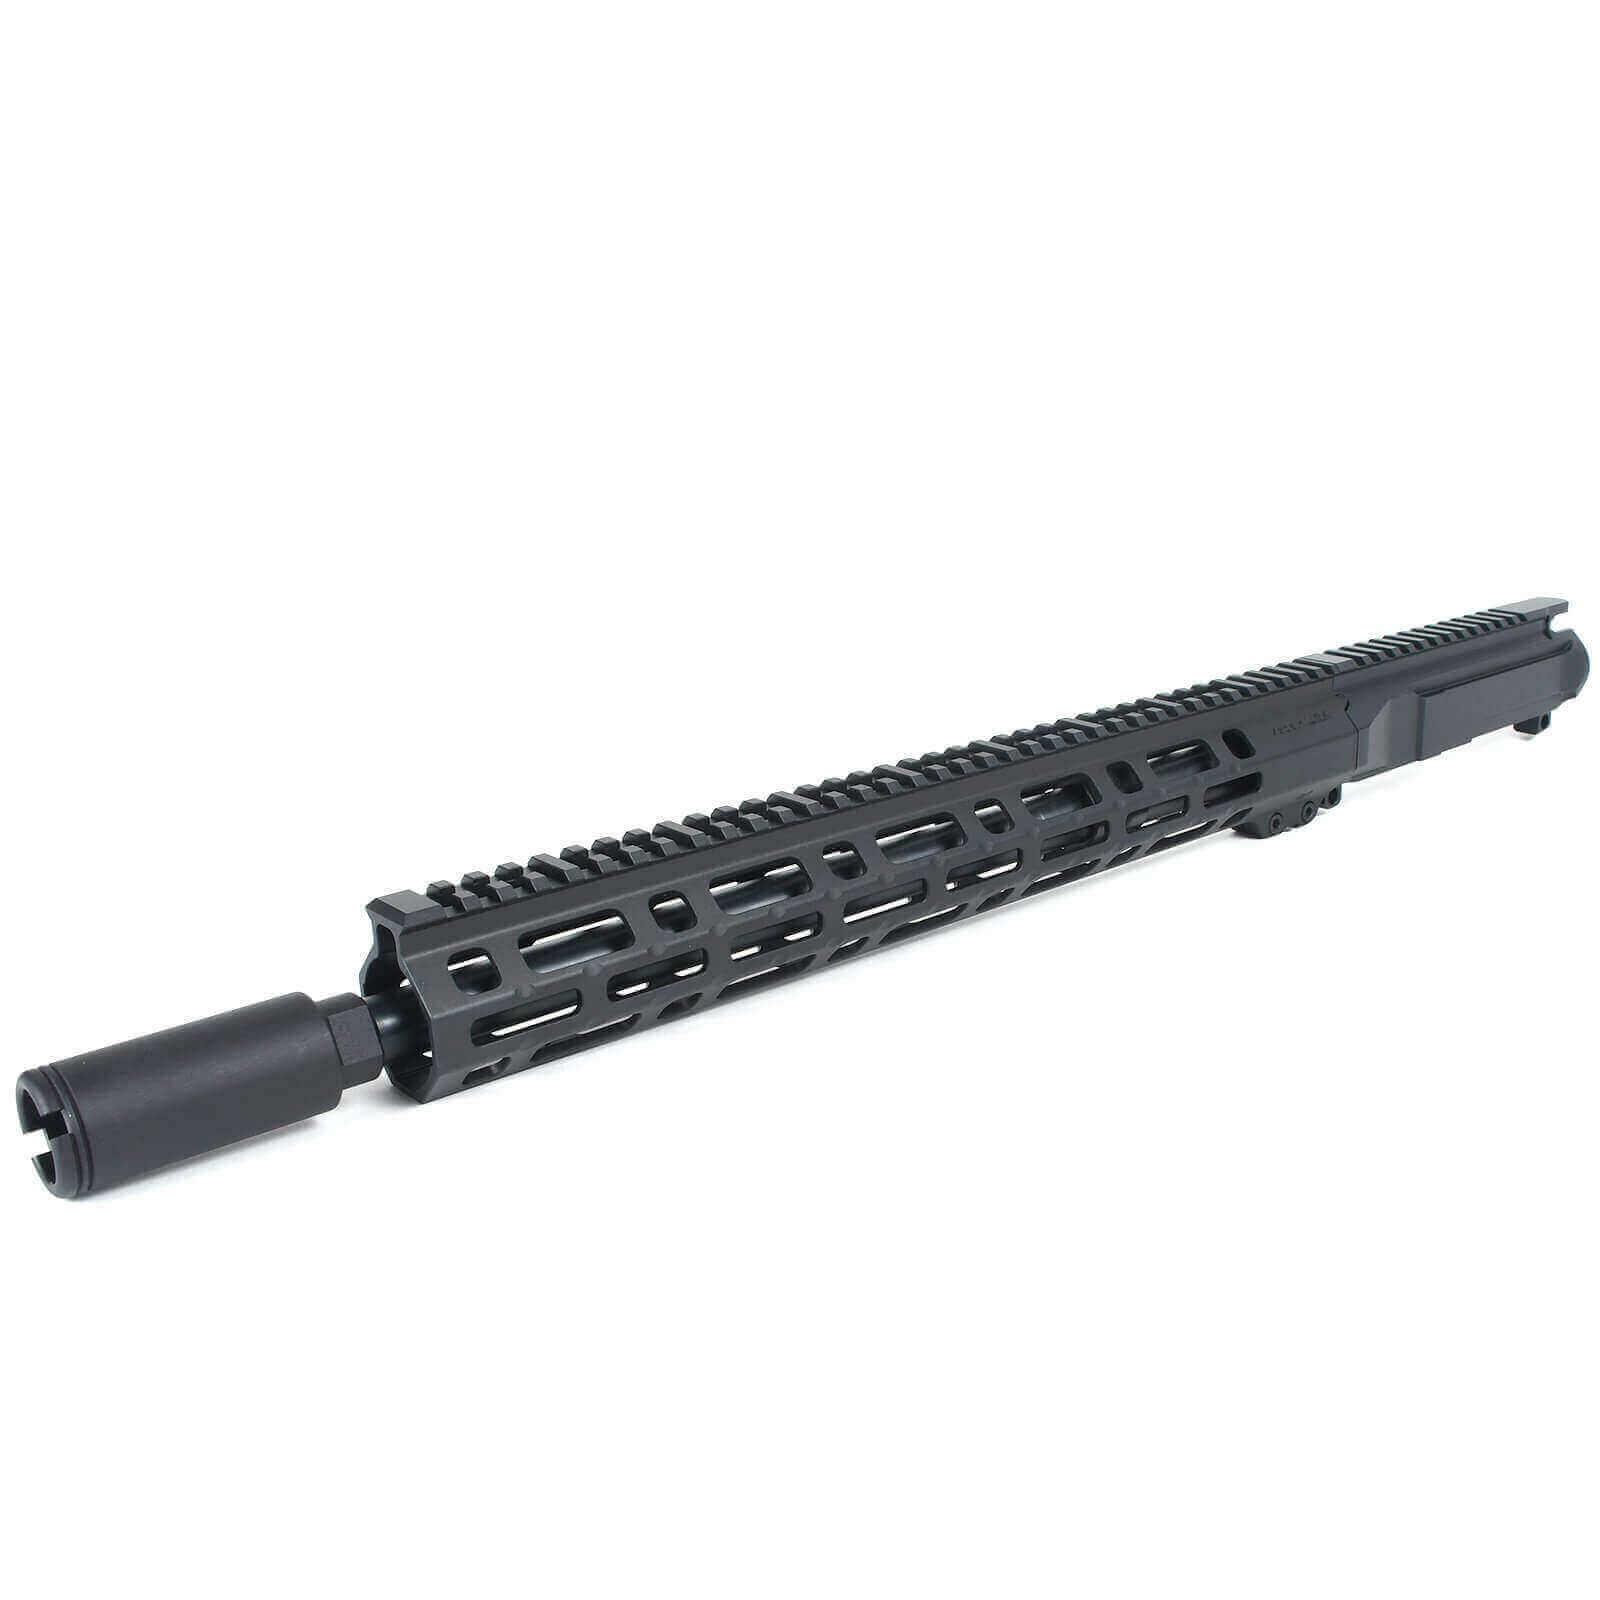 AT3™ FF-ML 16 Inch  300 BLK Complete Upper -  300 AAC Blackout 16 Inch  Ballistic Advantage Barrel - 15